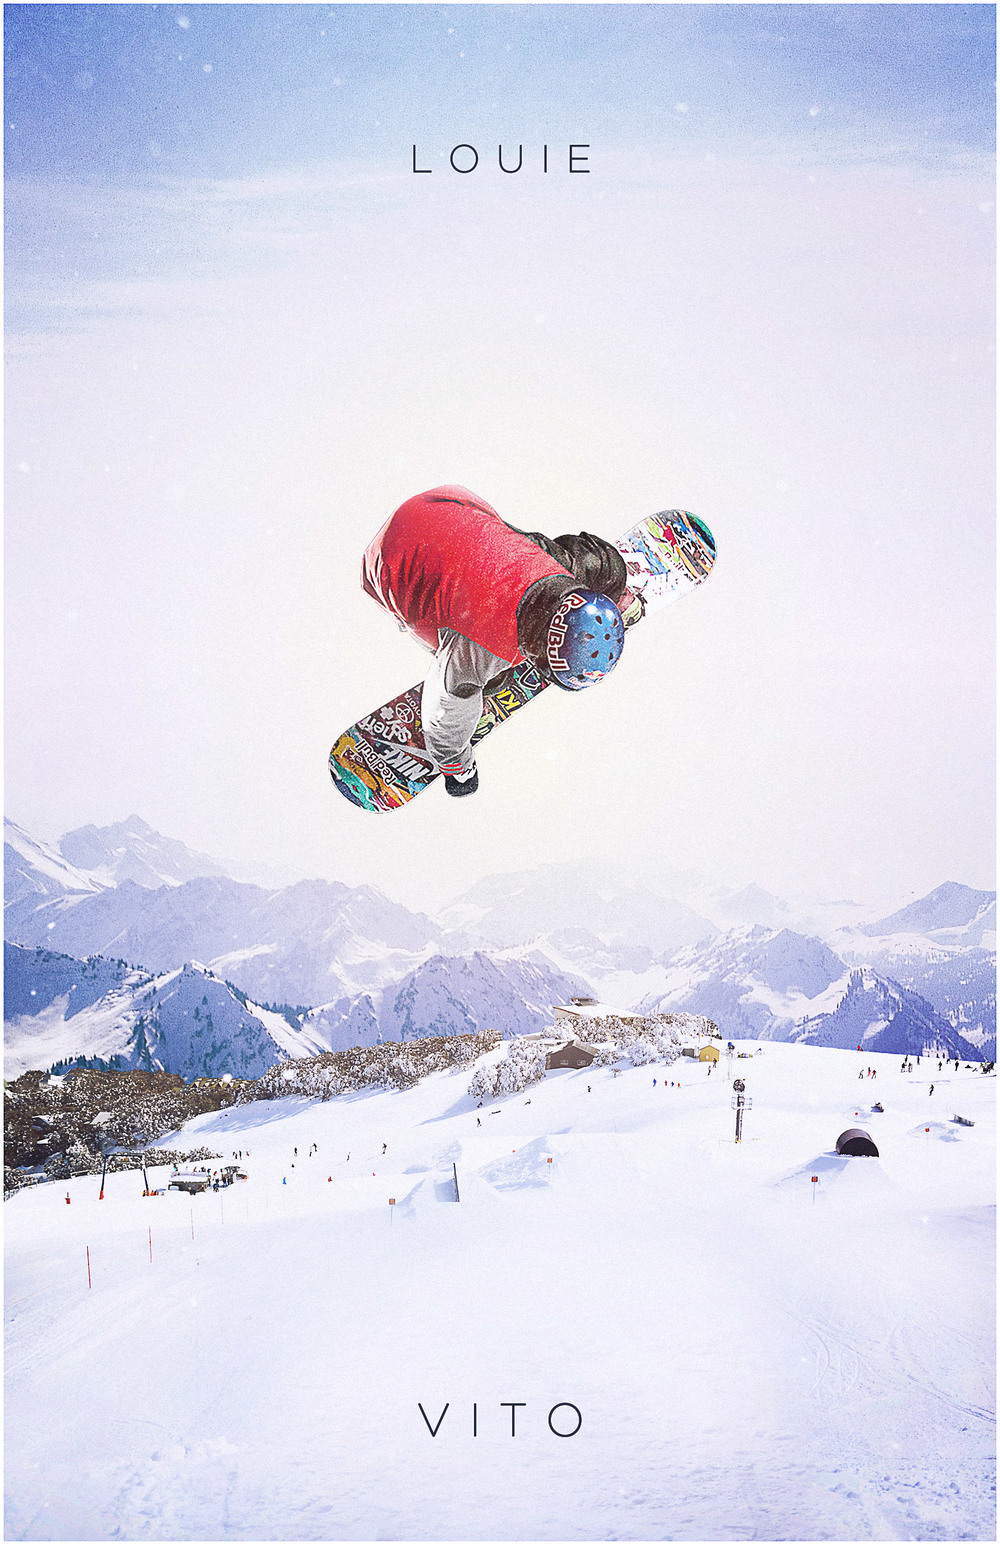 RedBull_Snowboard_Large_1